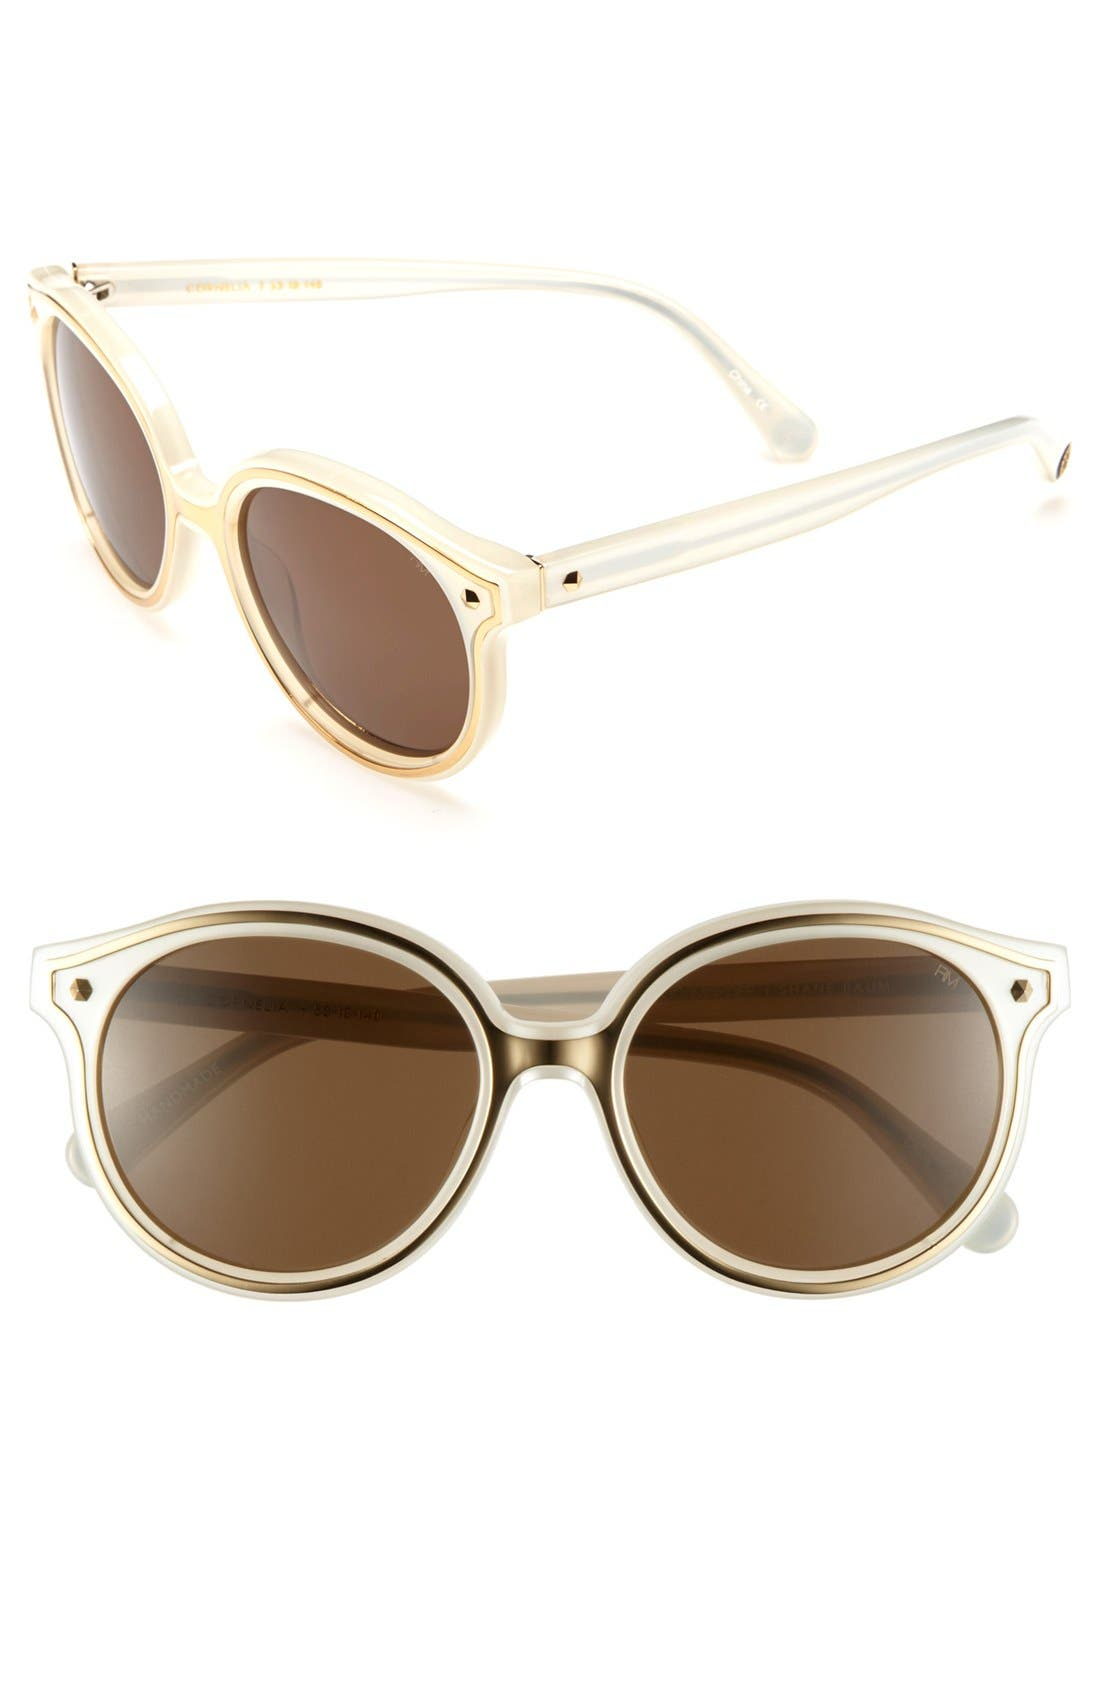 Alternate Image 1 Selected - Rebecca Minkoff 'Cornelia' 53mm Sunglasses